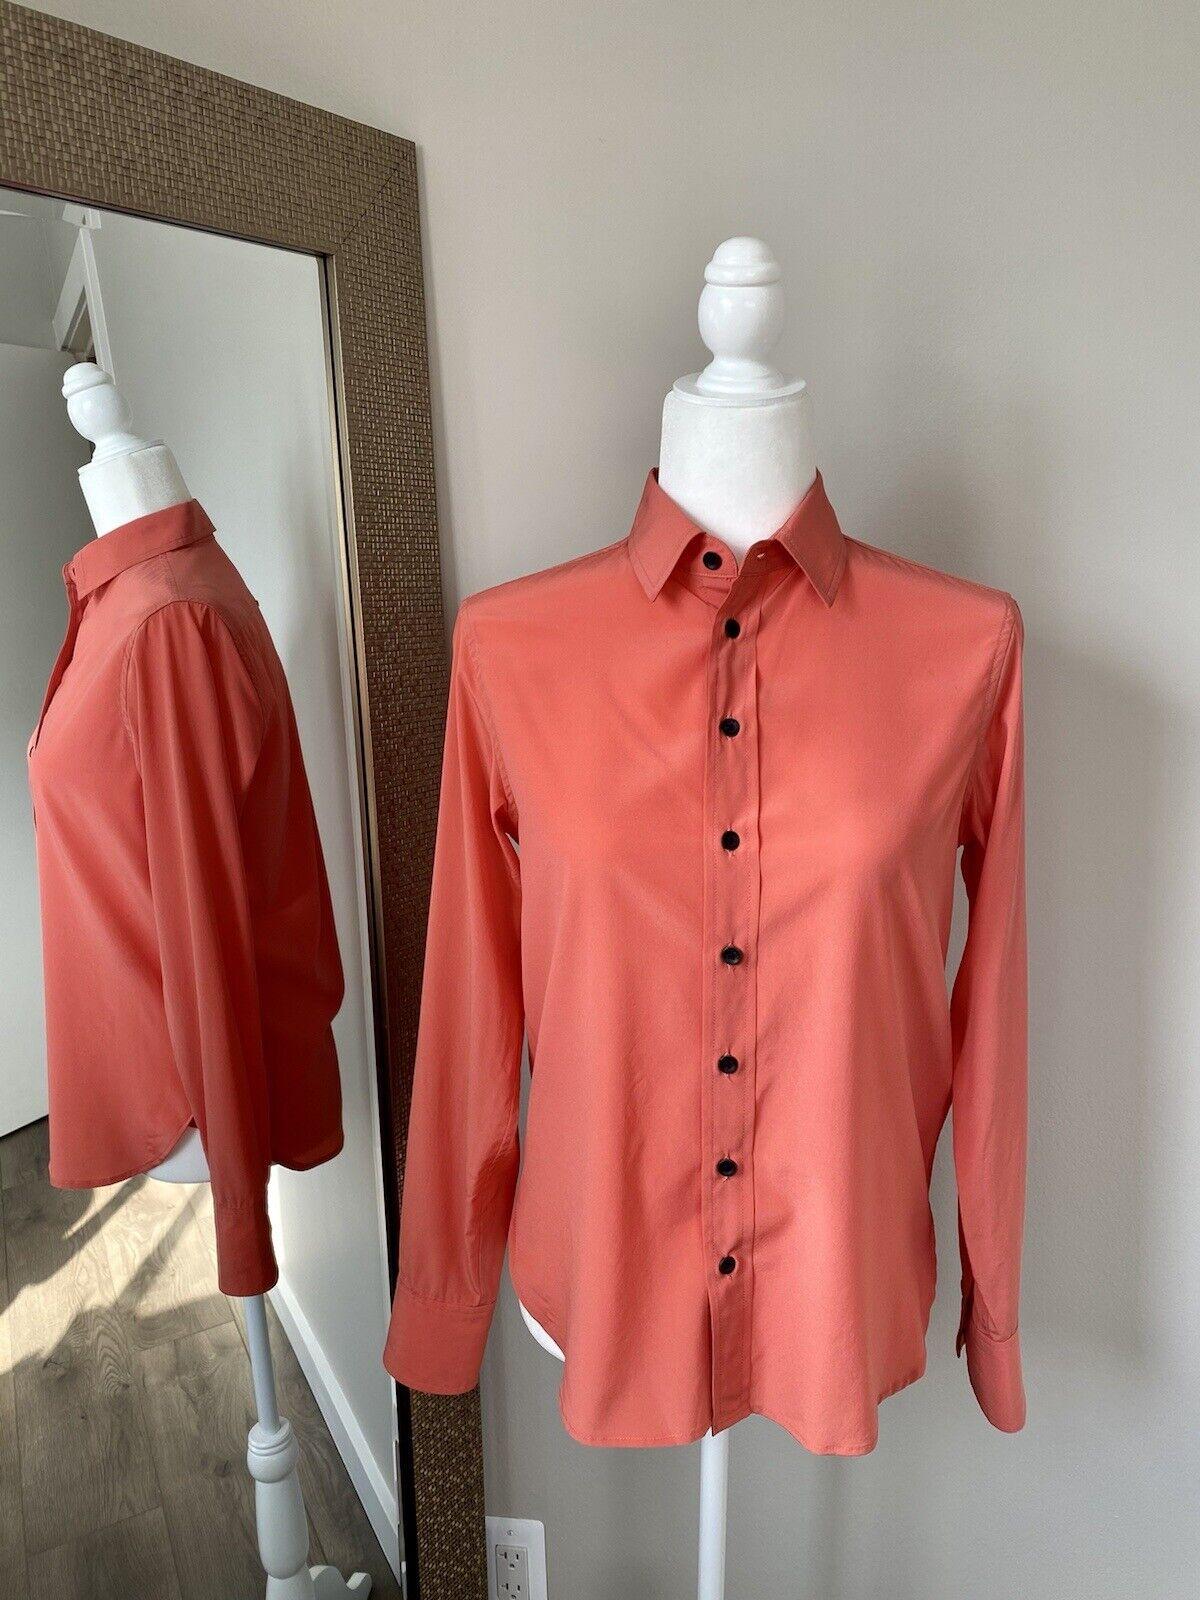 rag and bone silk blouse - image 1